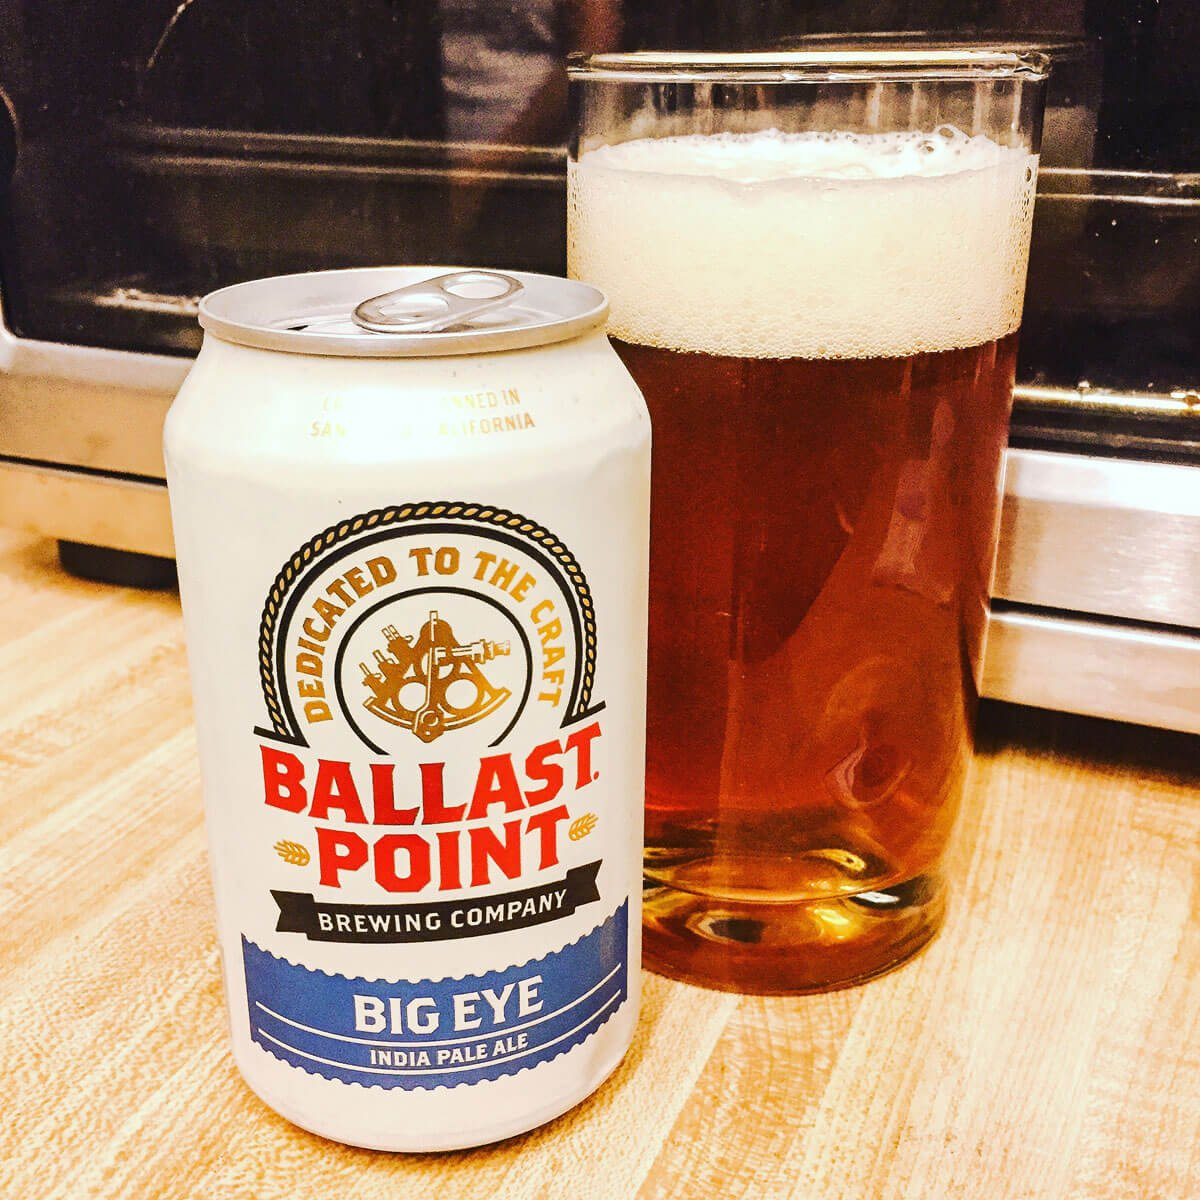 Big Eye, an American IPA by Ballast Point Brewing Company